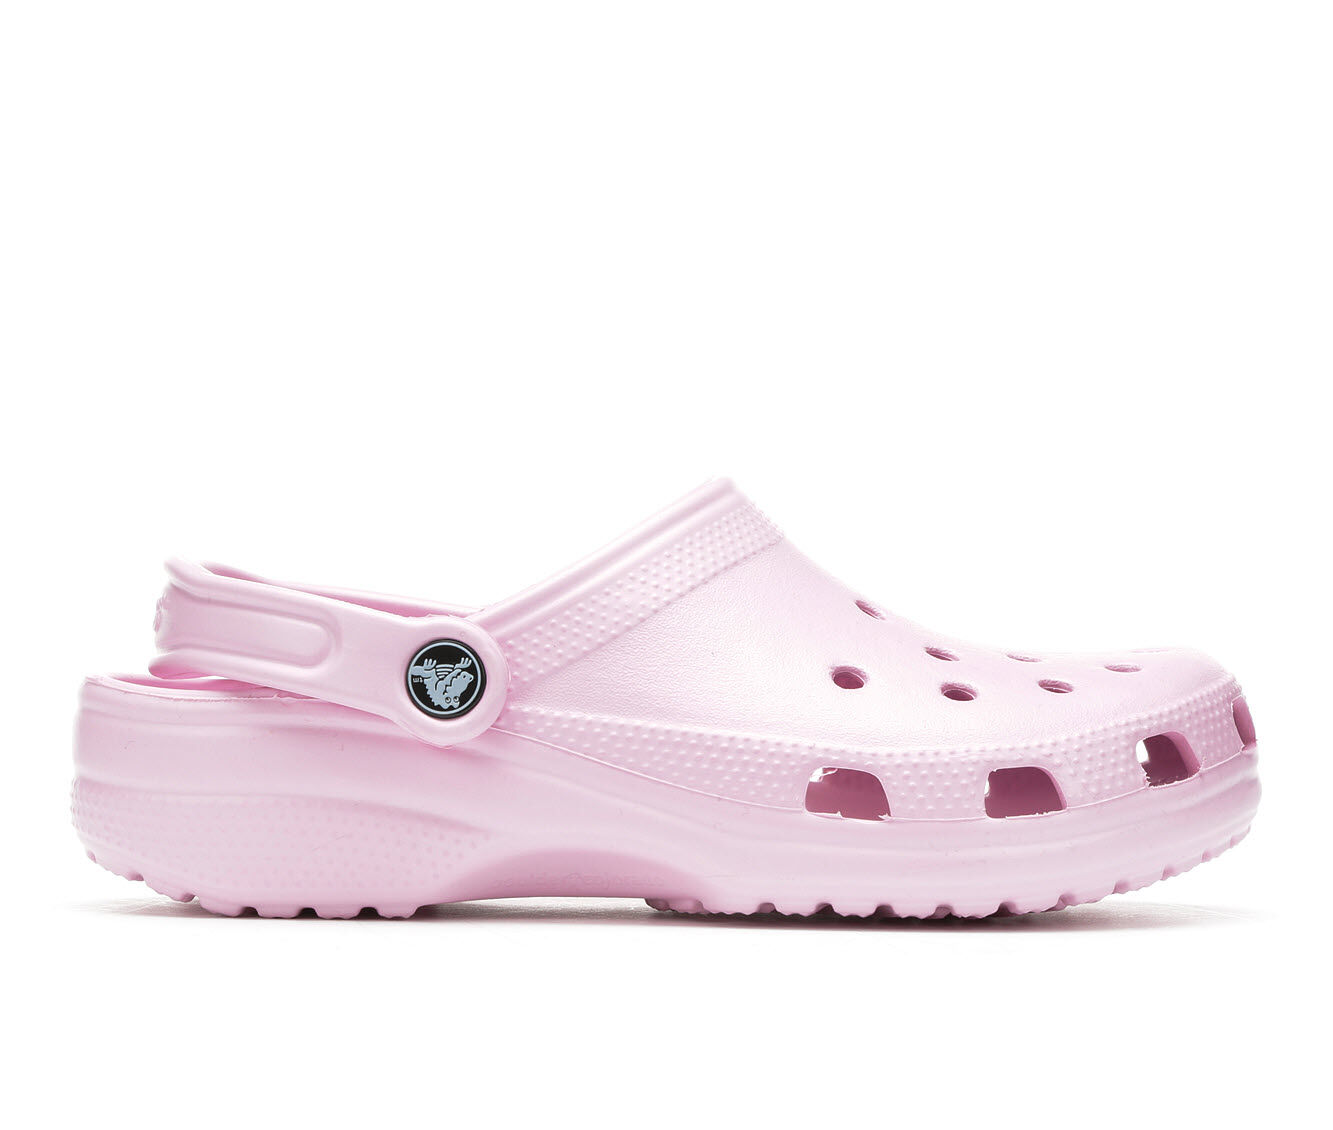 Women's Crocs Classic Clogs Ballerina Pink